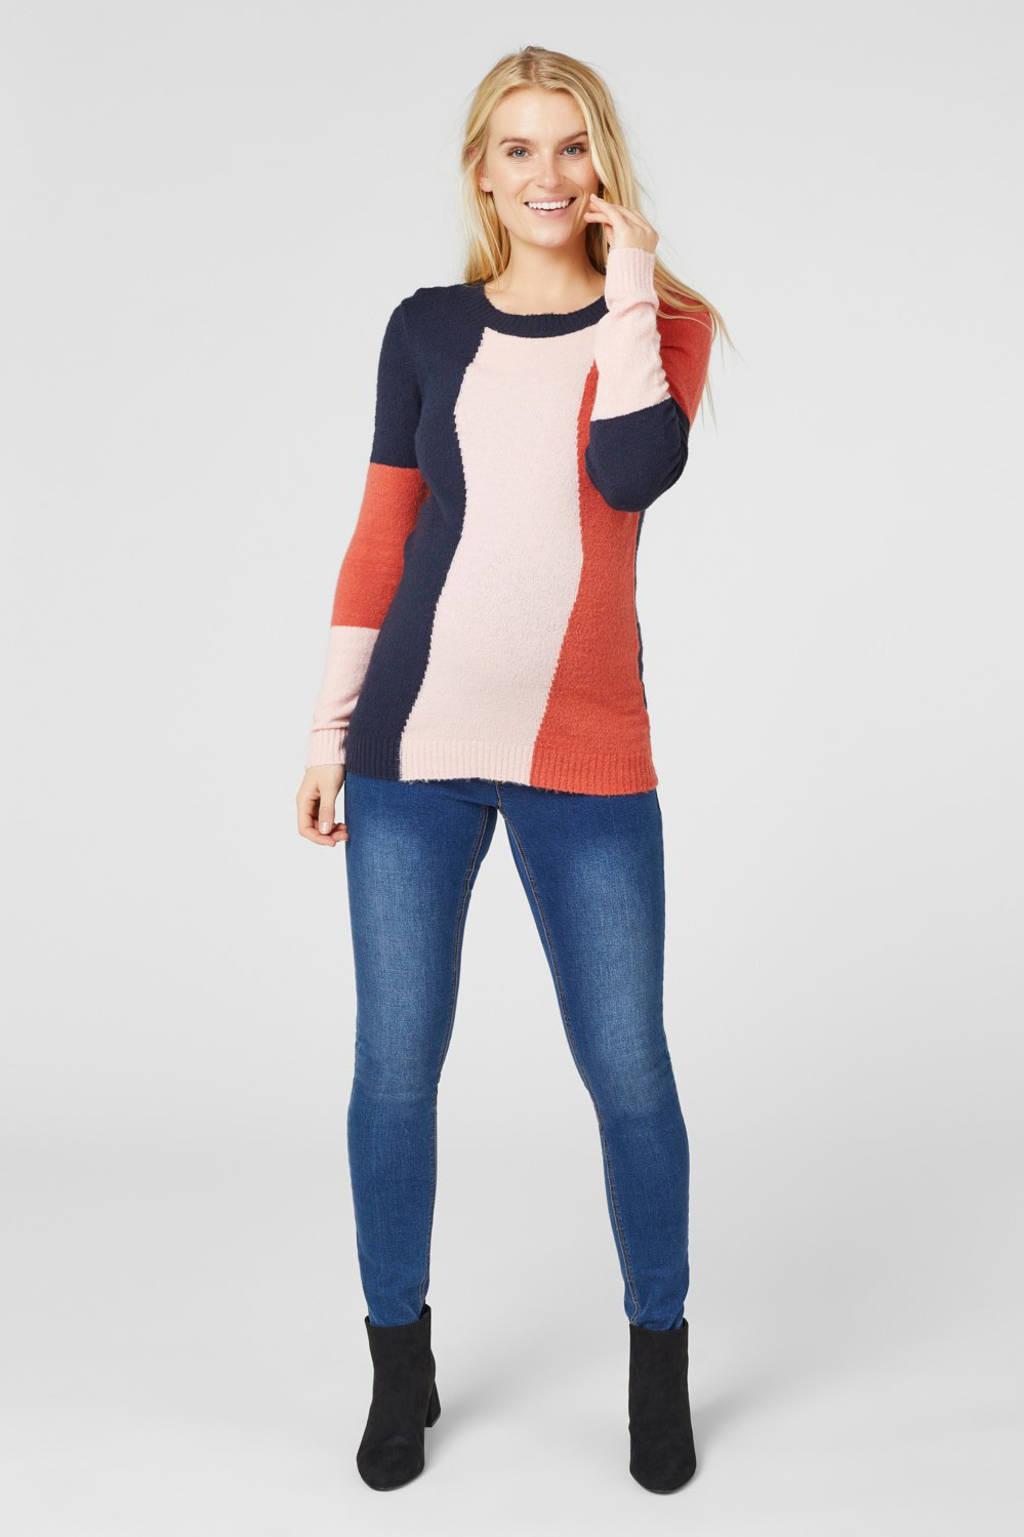 MAMALICIOUS zwangerschapssweater Tiana met ceintuur roze/donkerblauw/rood, Roze/donkerblauw/rood